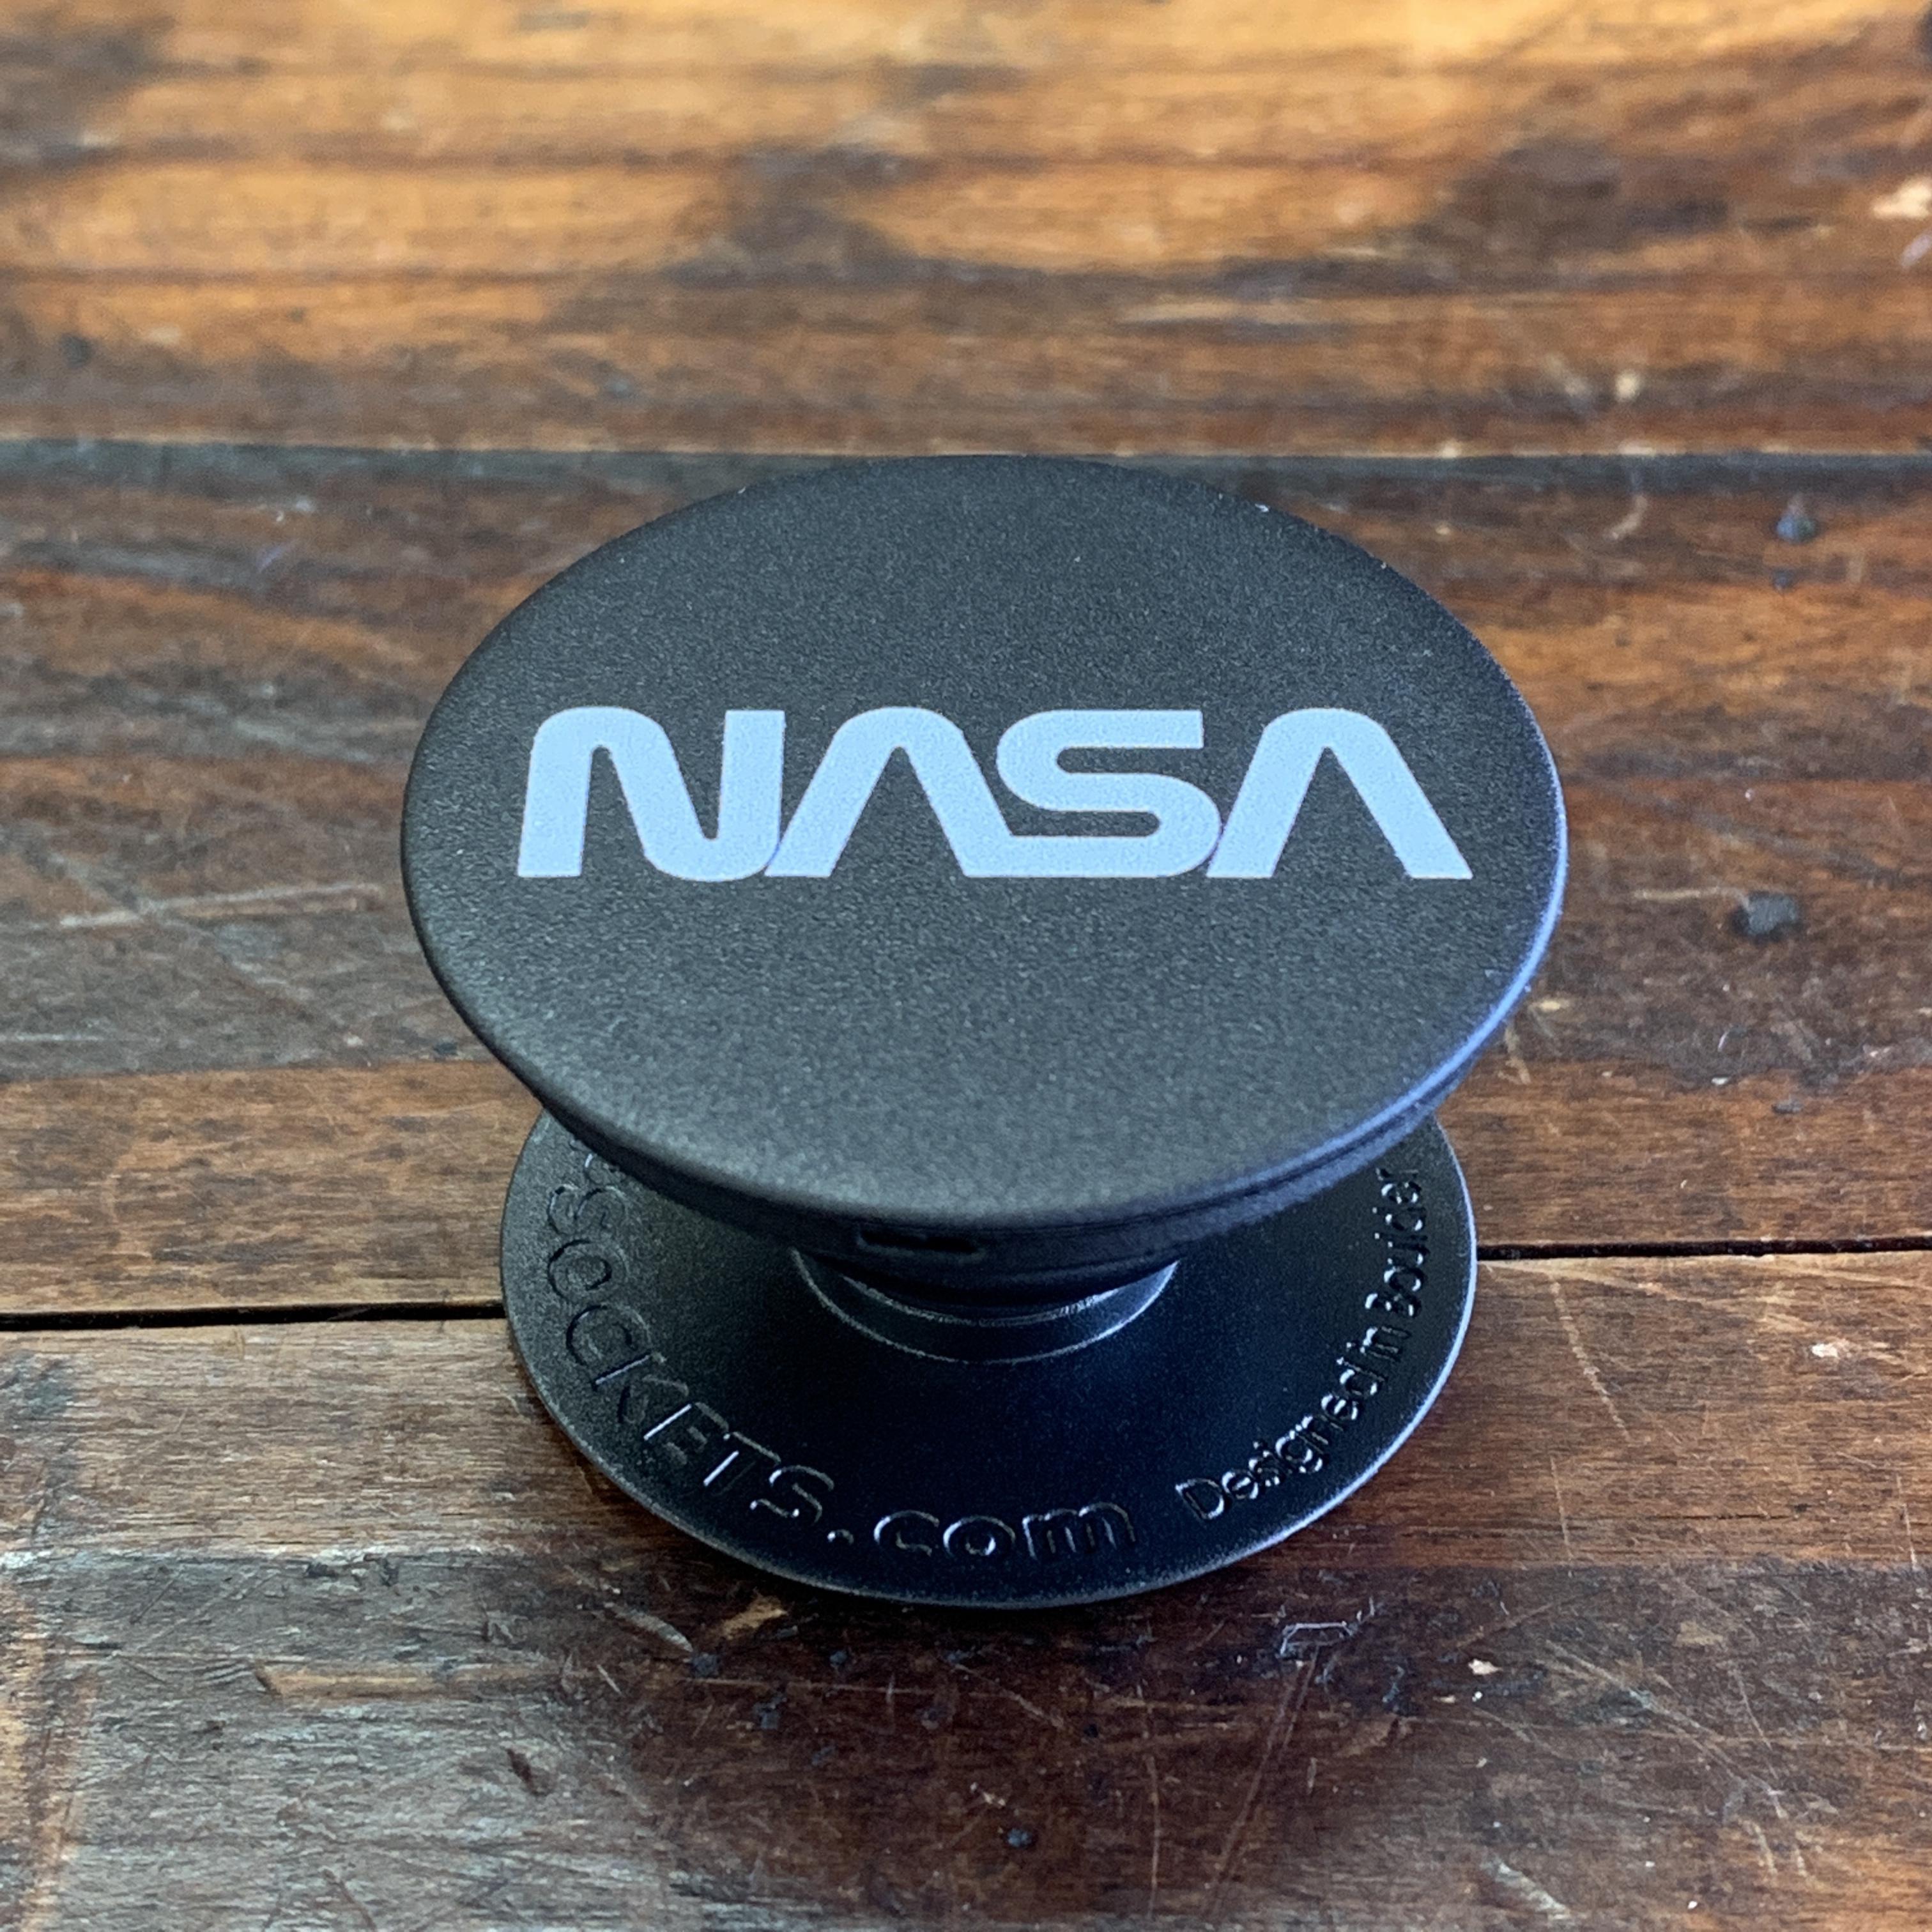 NASA公認(アメリカ航空宇宙局)・Popsockets・ポップソケット・グリップ・ロゴタイプ(ワーム)